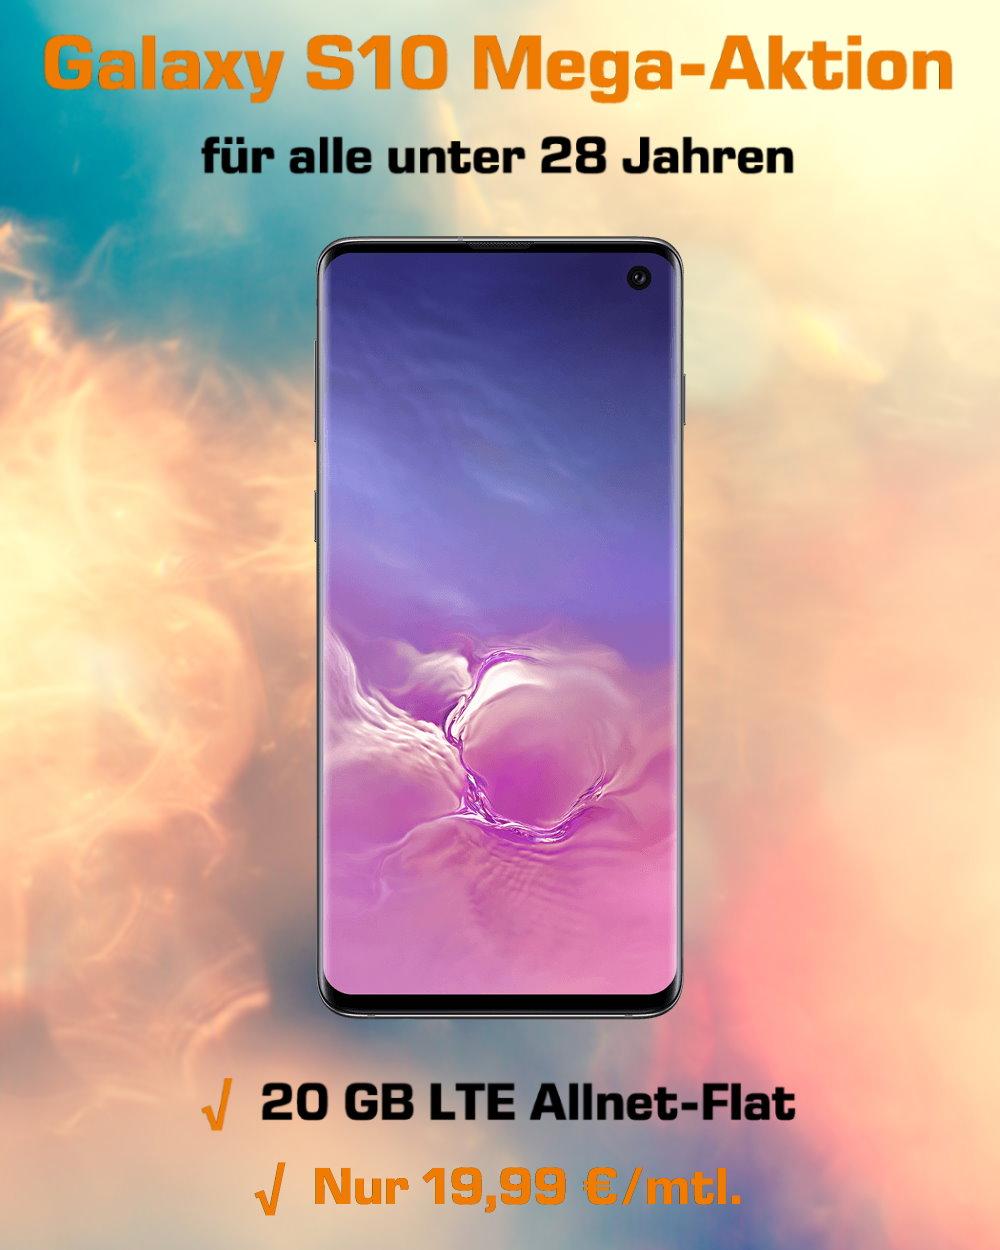 Galaxy S10 inklusive 20 GB LTE Allnet-Flat zum absoluten Tiefstpreis